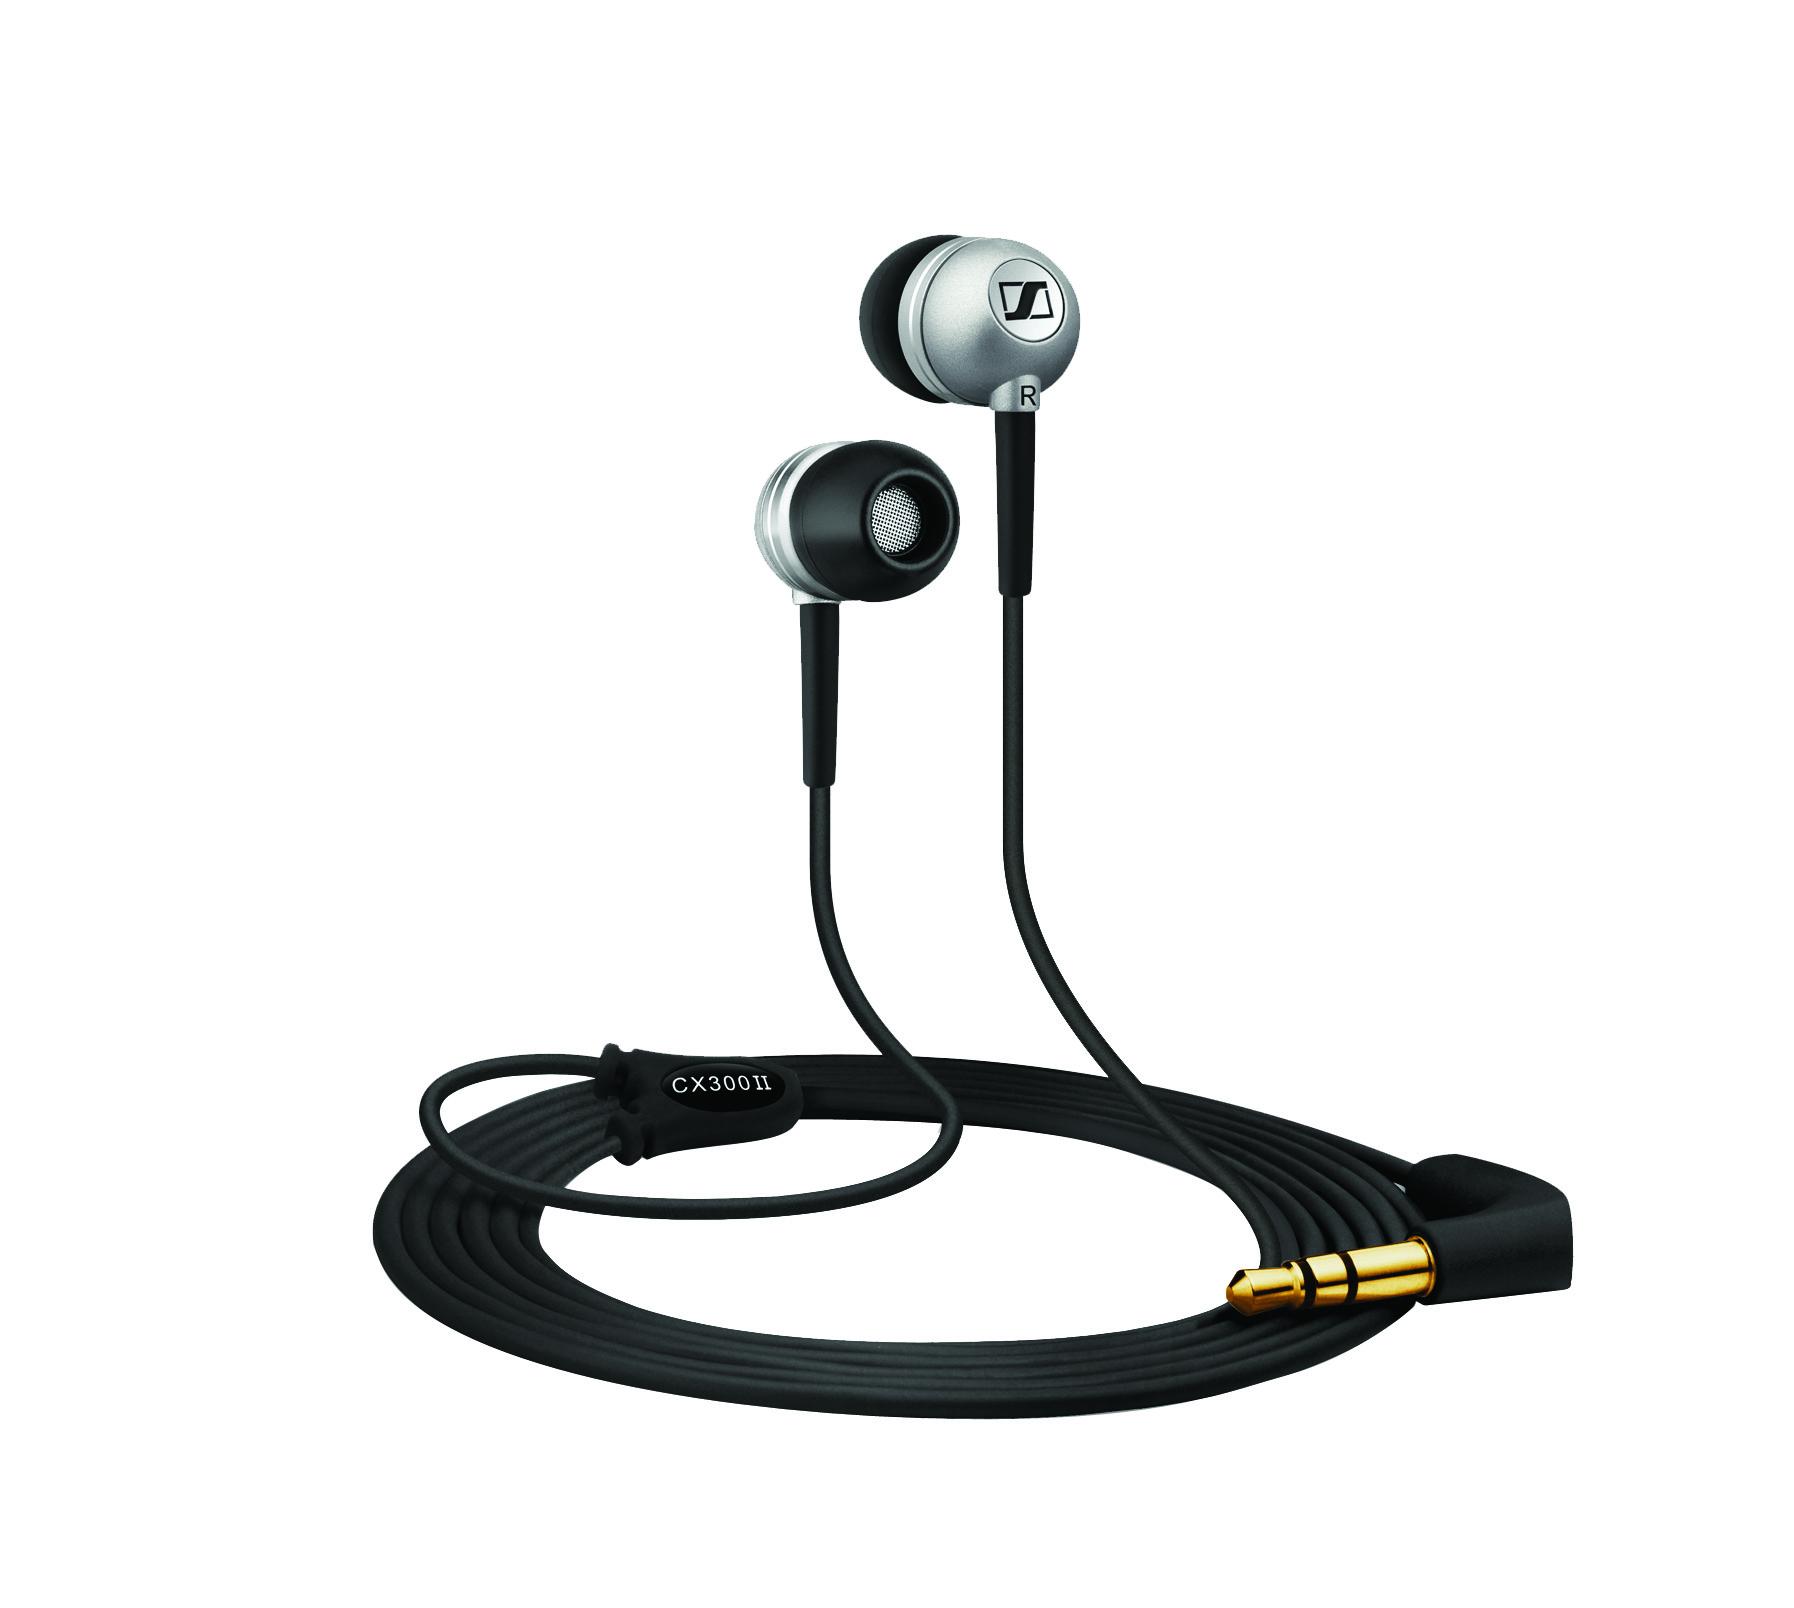 Sennheiser CX 300-II Noise cancelling Earbuds Headphones